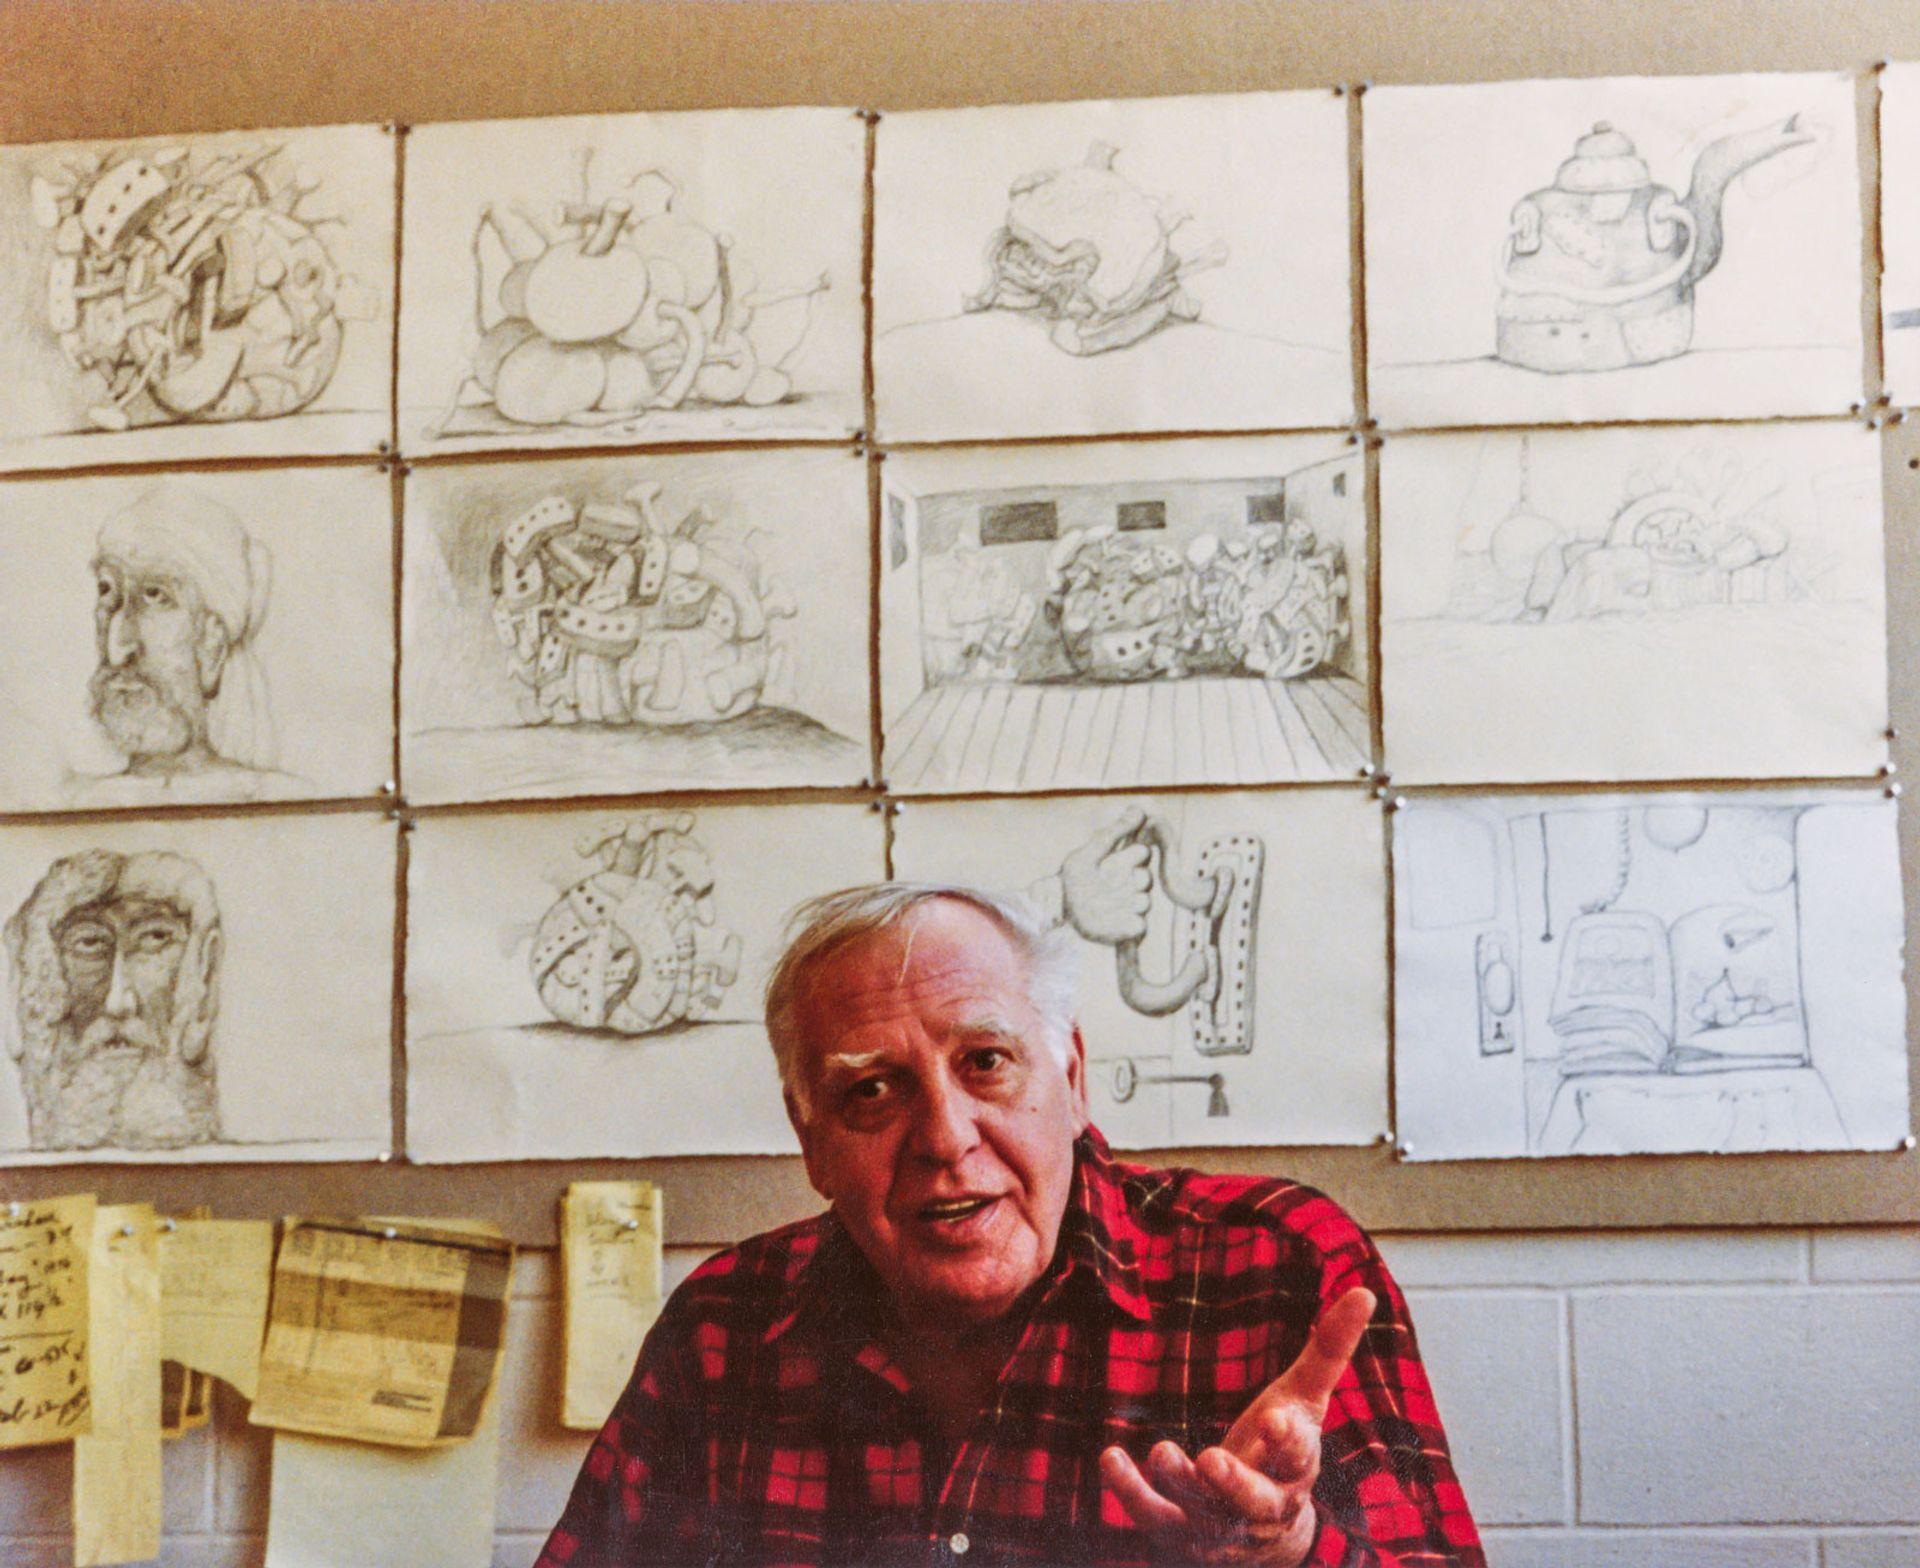 Philip Guston in his studio in 1980 Photo: Sidney Felsen, Gemini G.E.L.